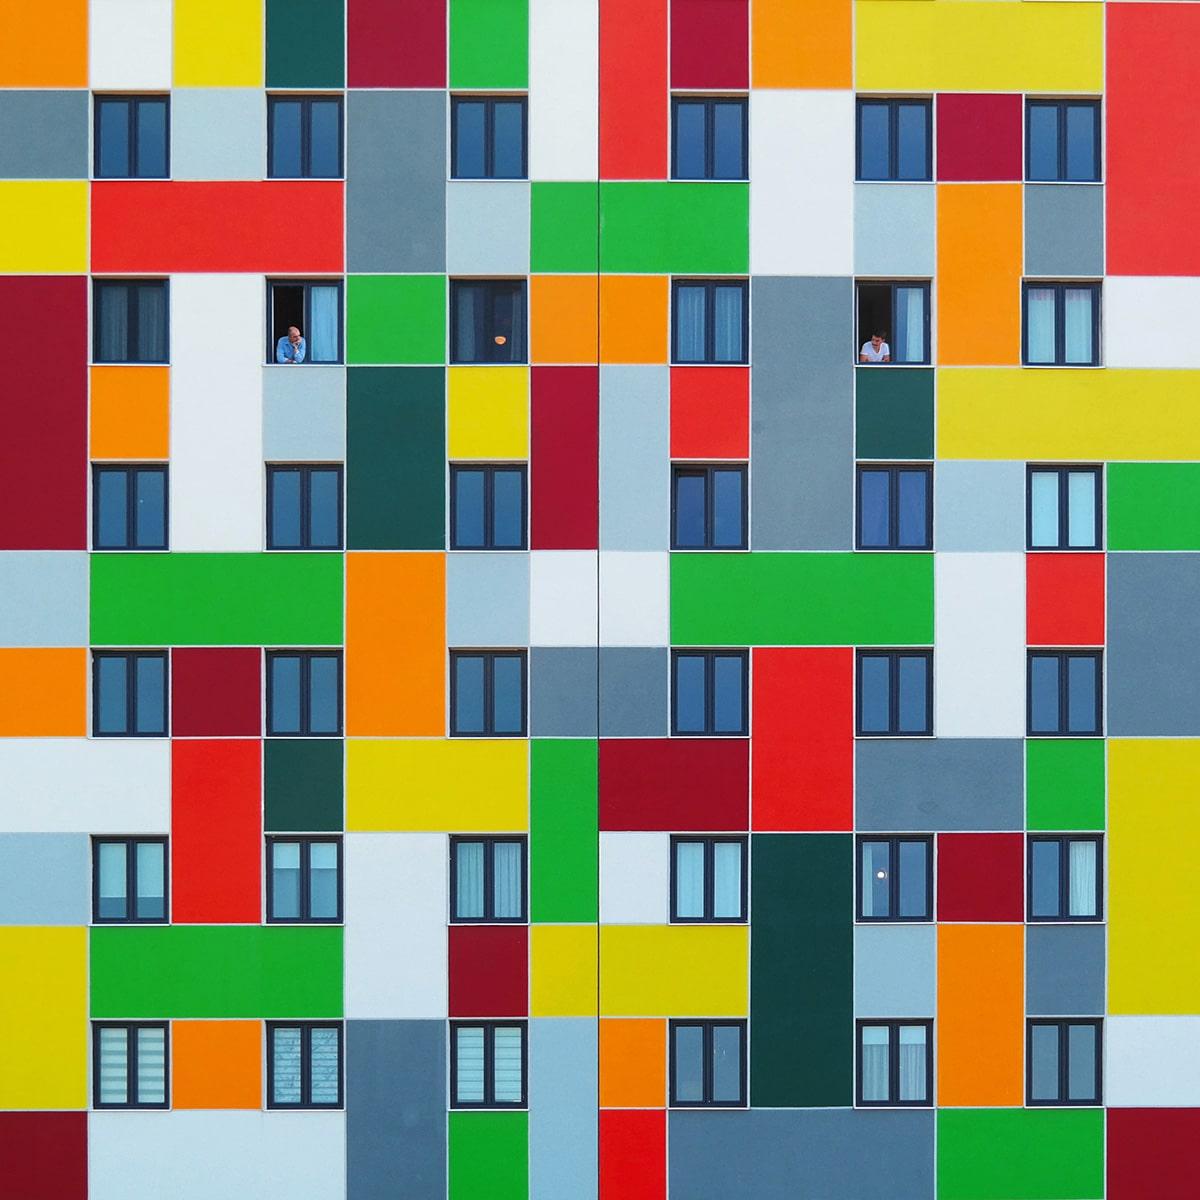 Yener Torun arquitectura de colores